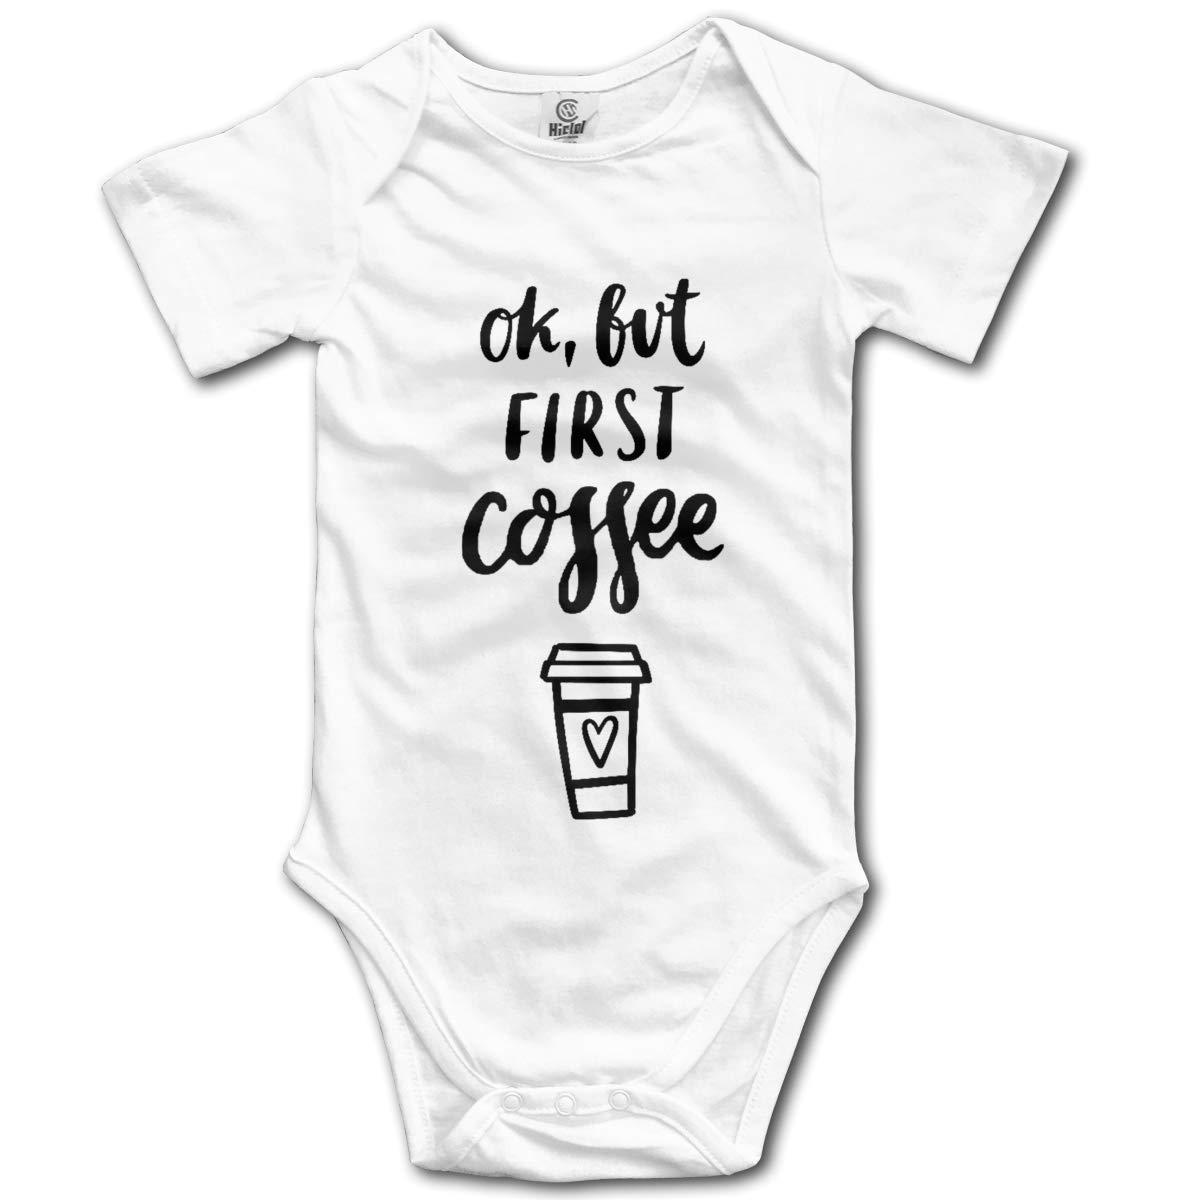 VANMASS Babys OK But First Coffee Short Sleeve Climbing Bodysuits Jumpsuit Romper